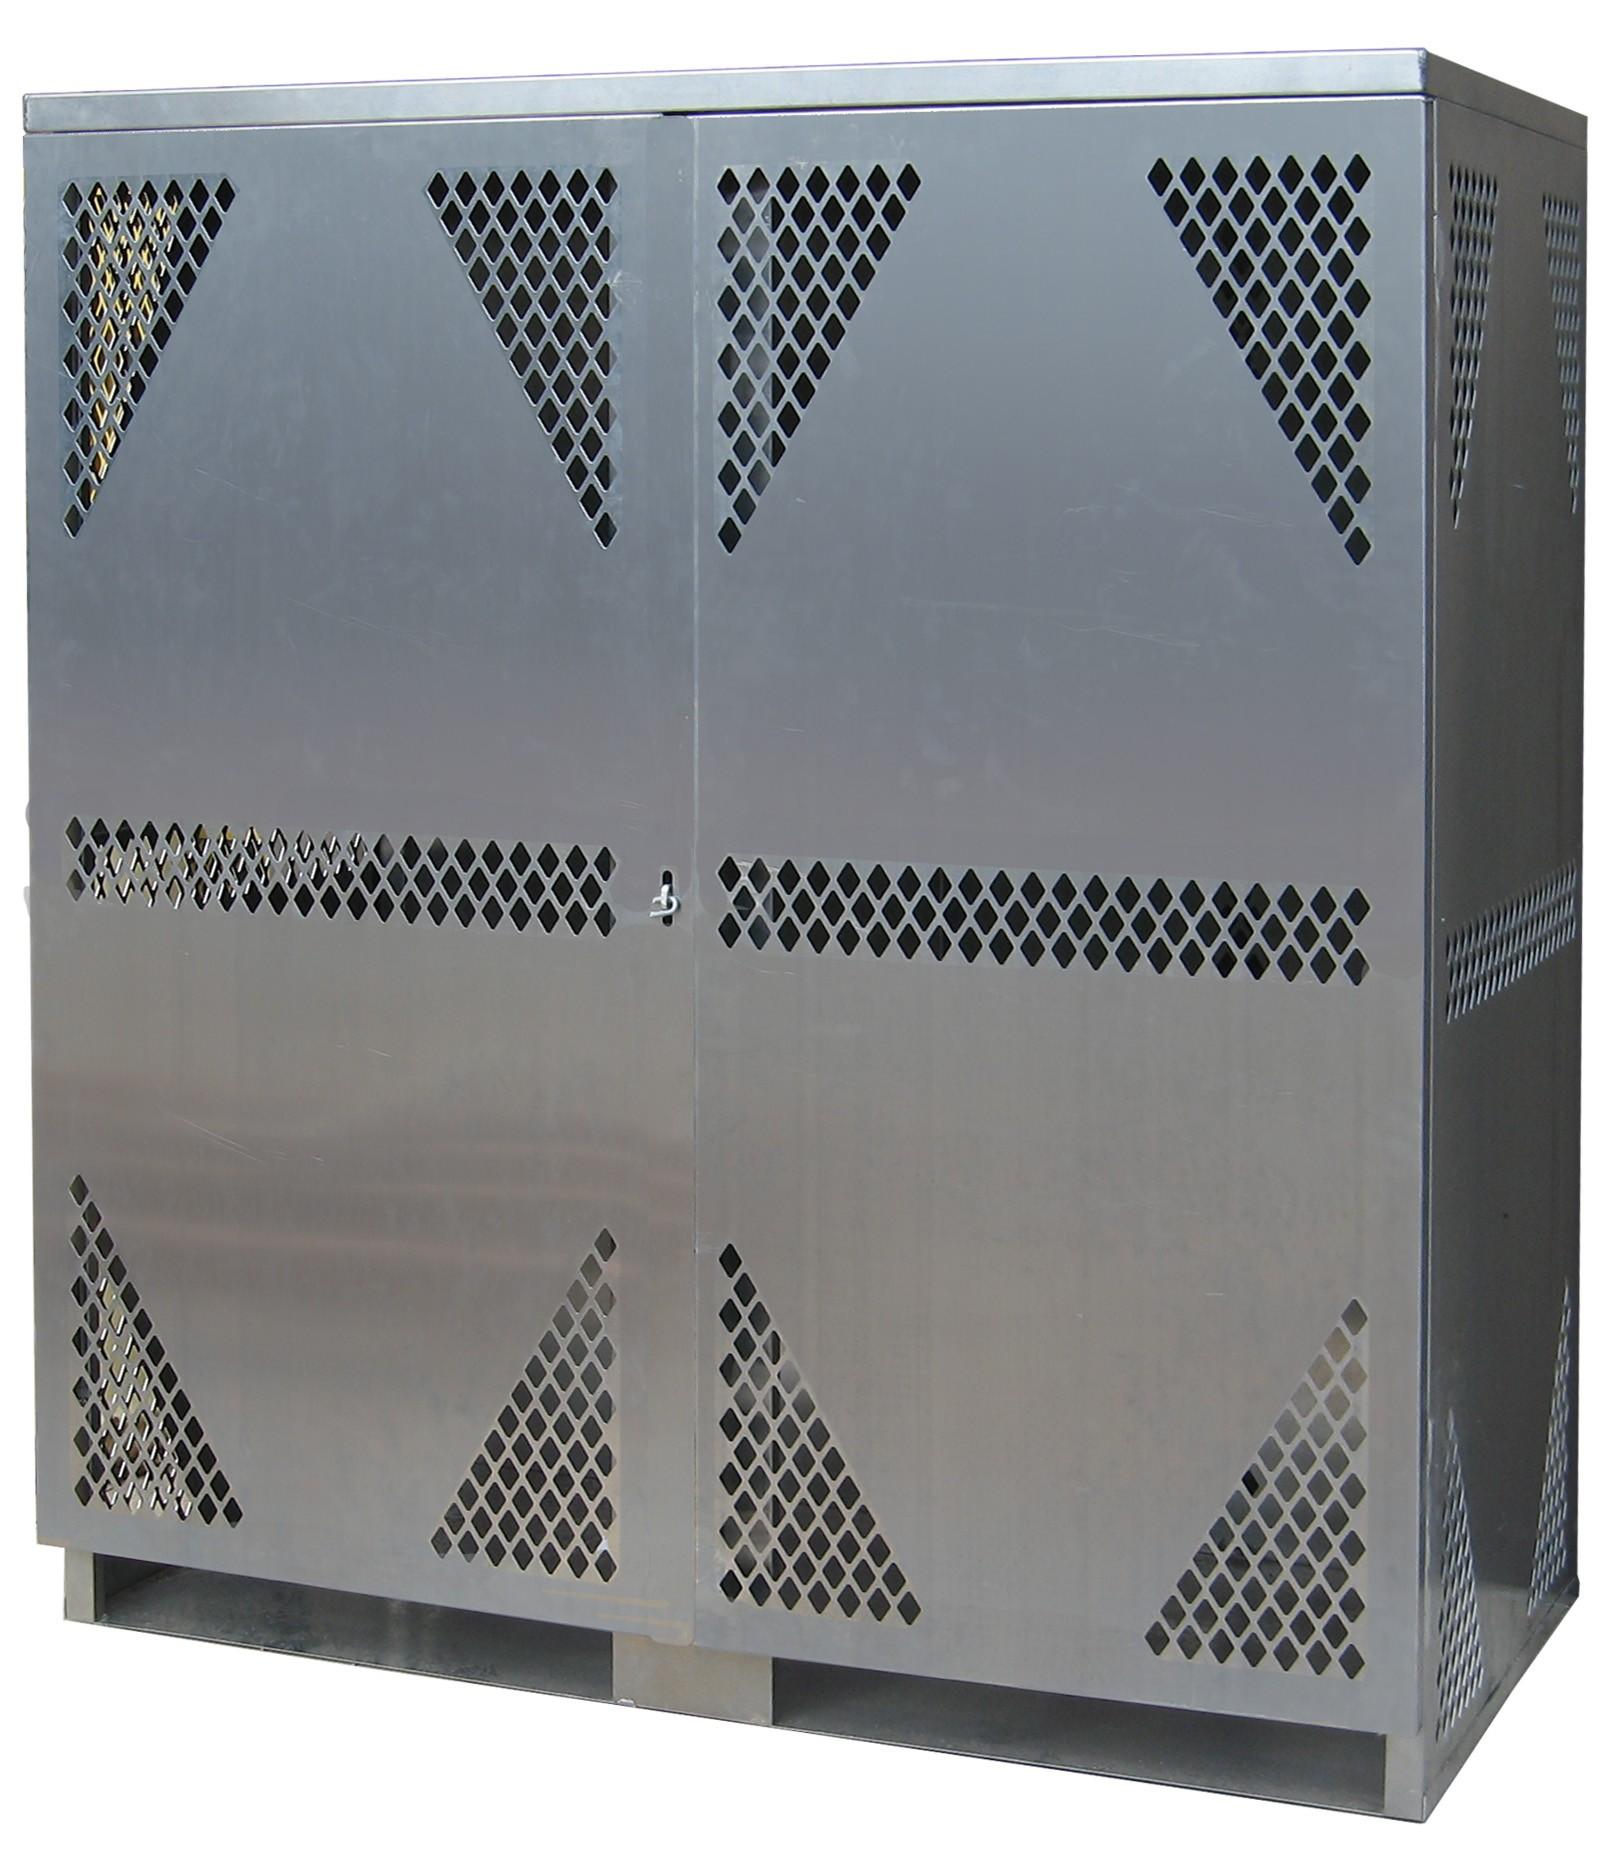 LP16 - Vertical - LP/Oxygen Storage Cabinet - 16 Cyl. Vertical Standard 2-Door